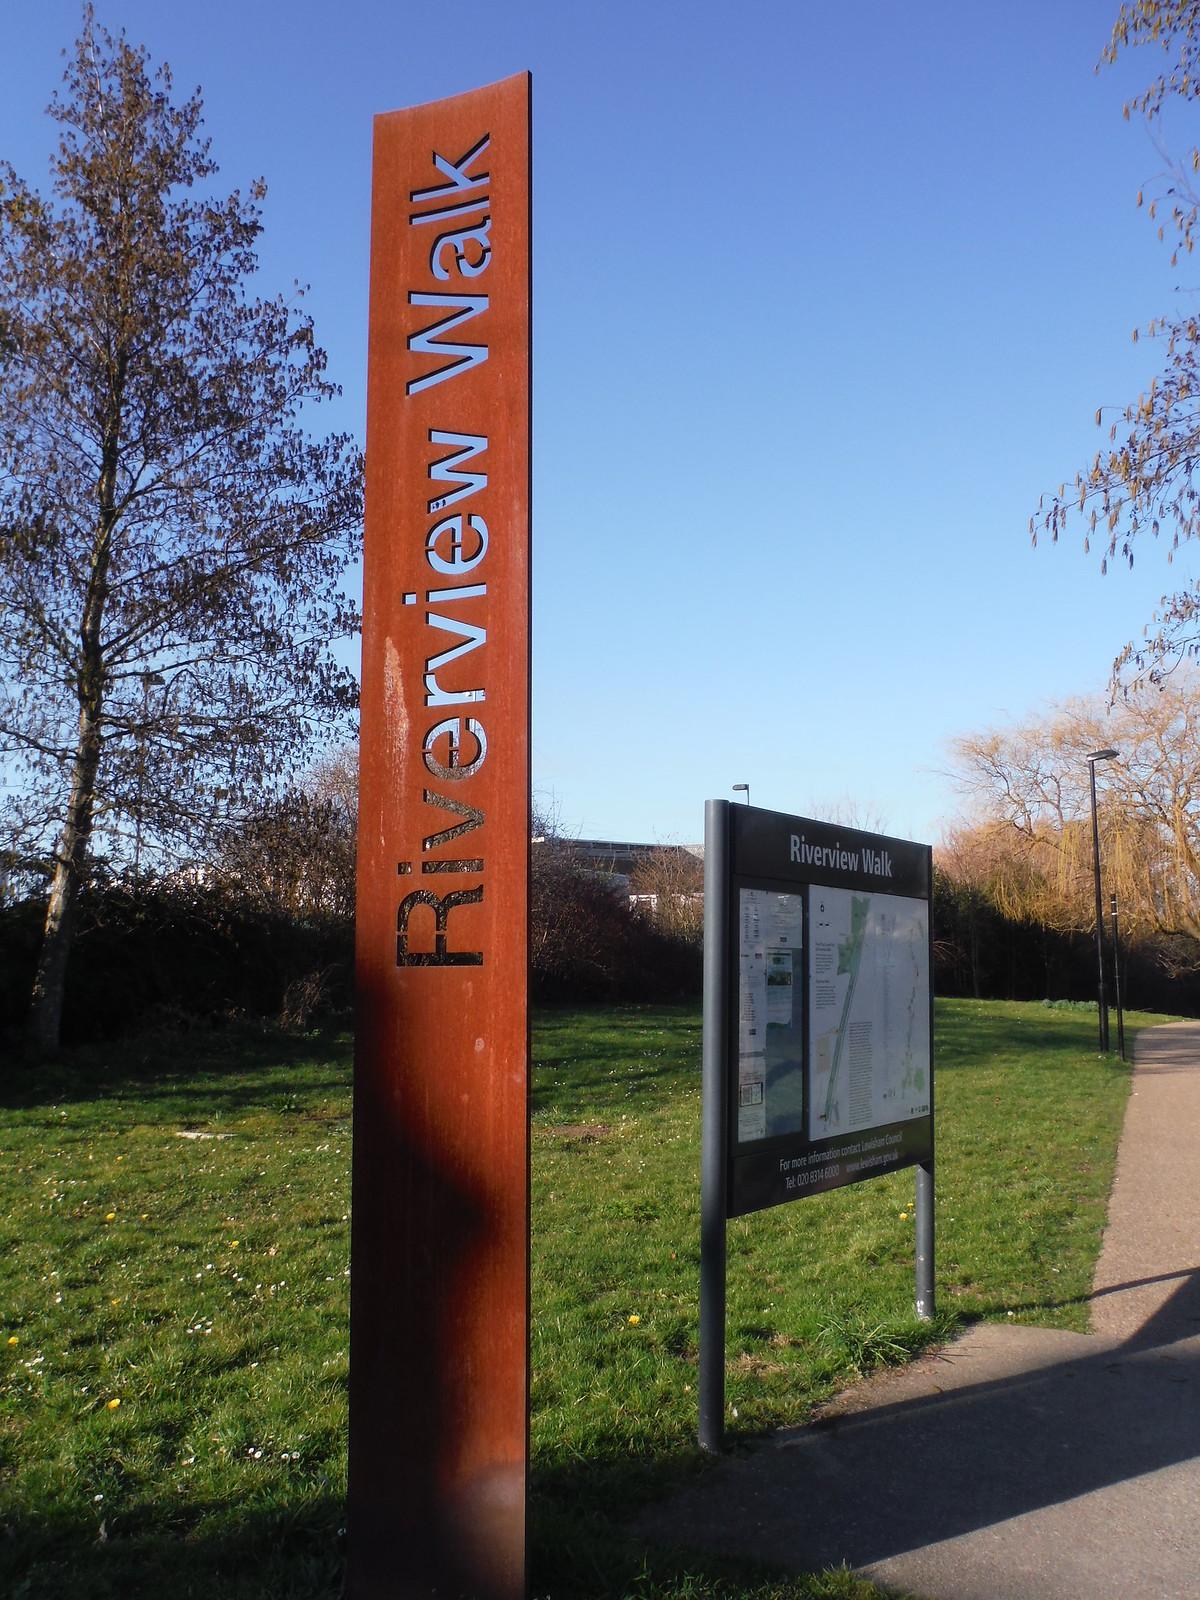 Corten Steel Totem Sign for The Riverview Walk, Lower Sydenham SWC Short Walk 36 - Waterlink Way (Lower Sydenham to Greenwich)